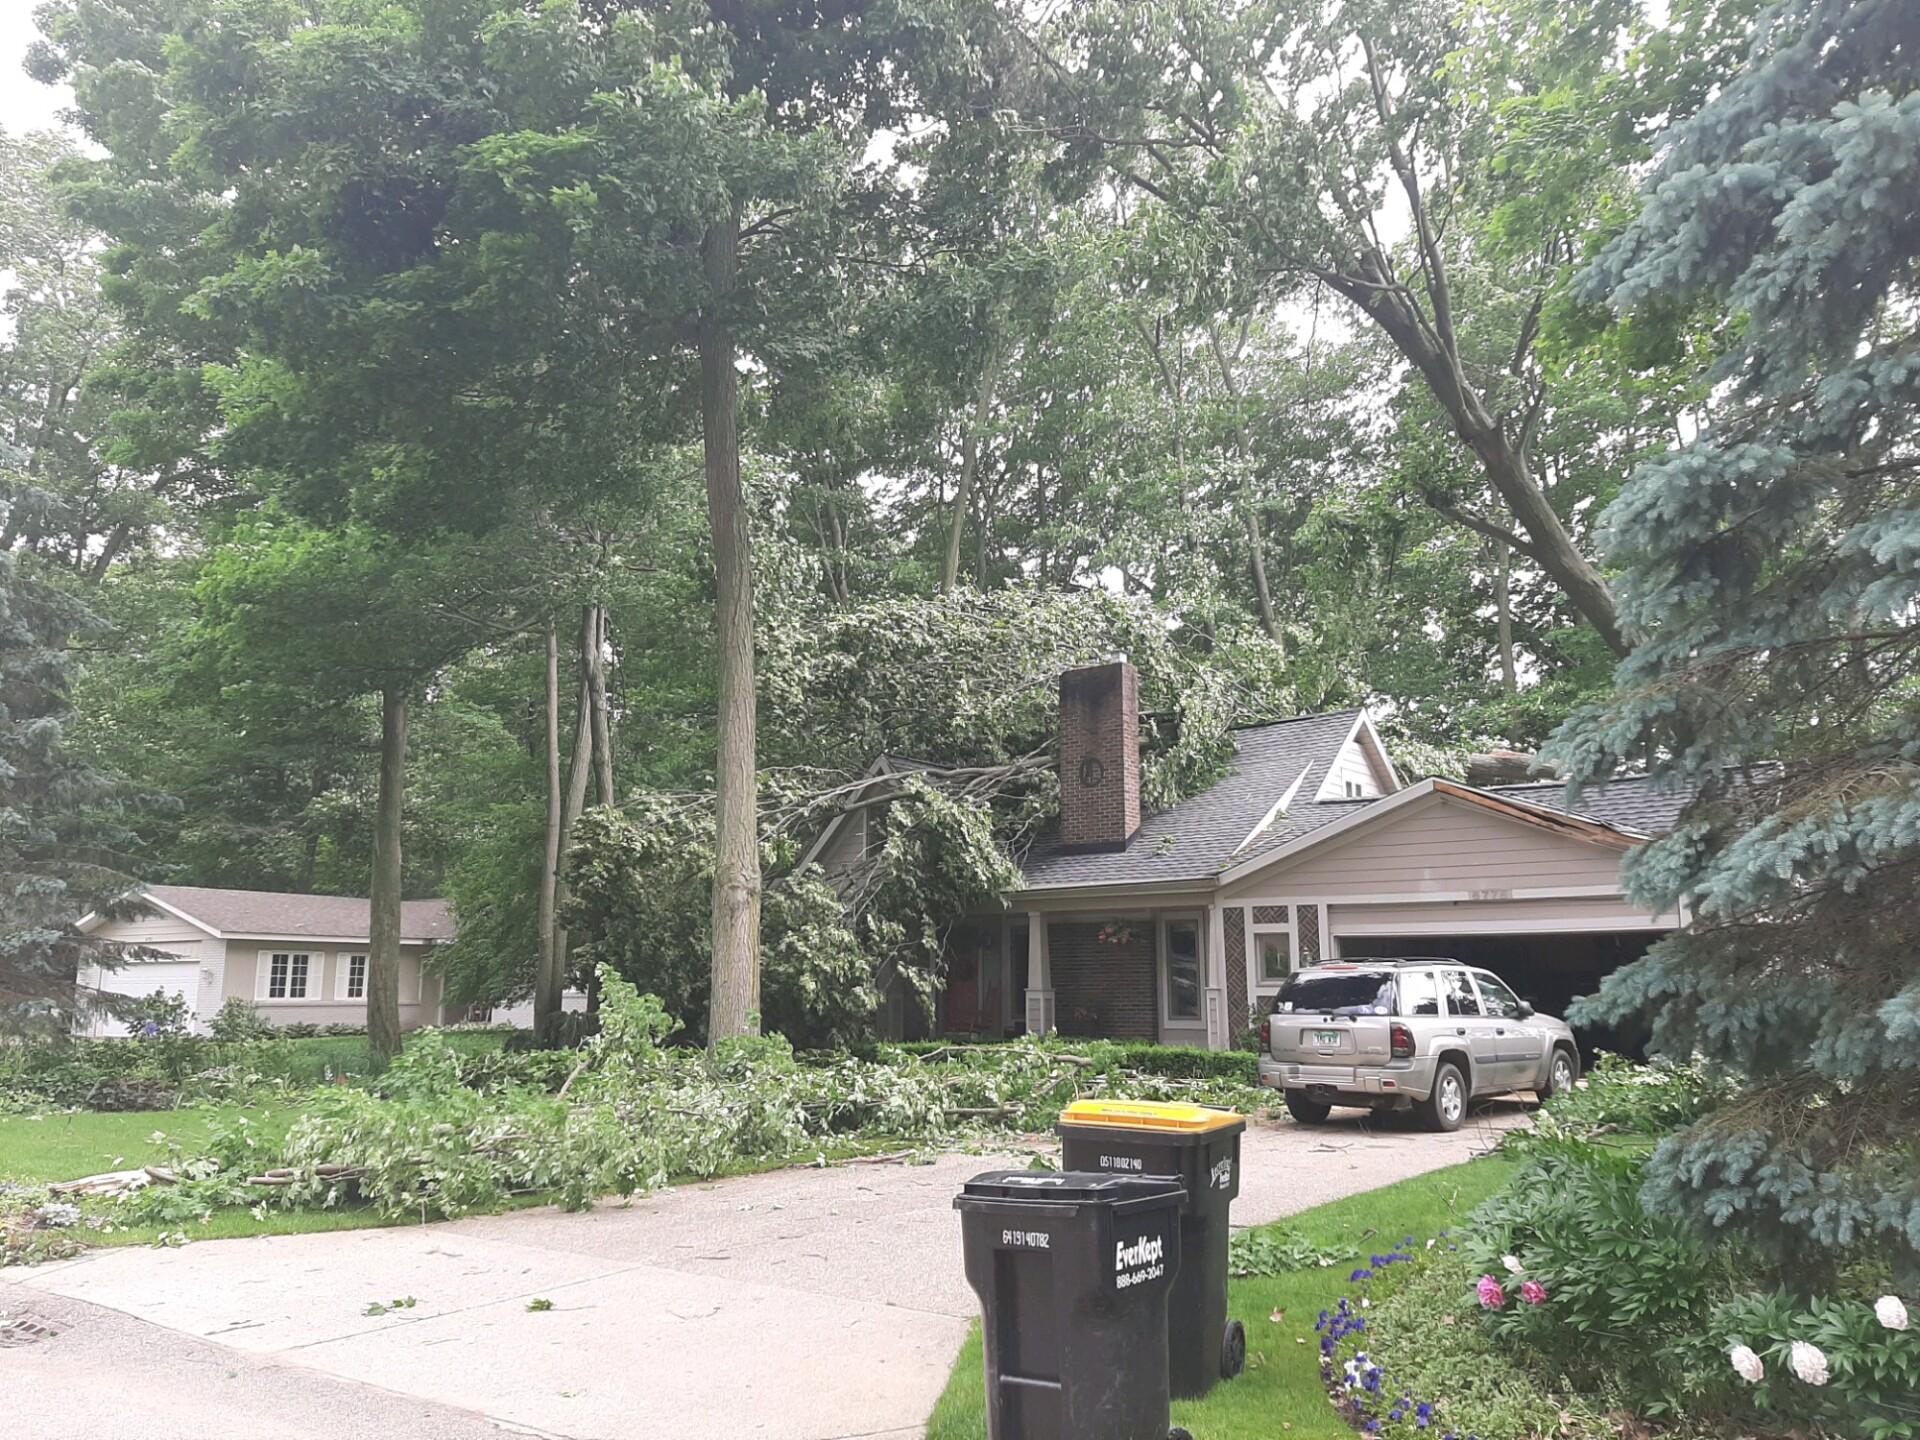 Gerogetown township storm damage.jpg